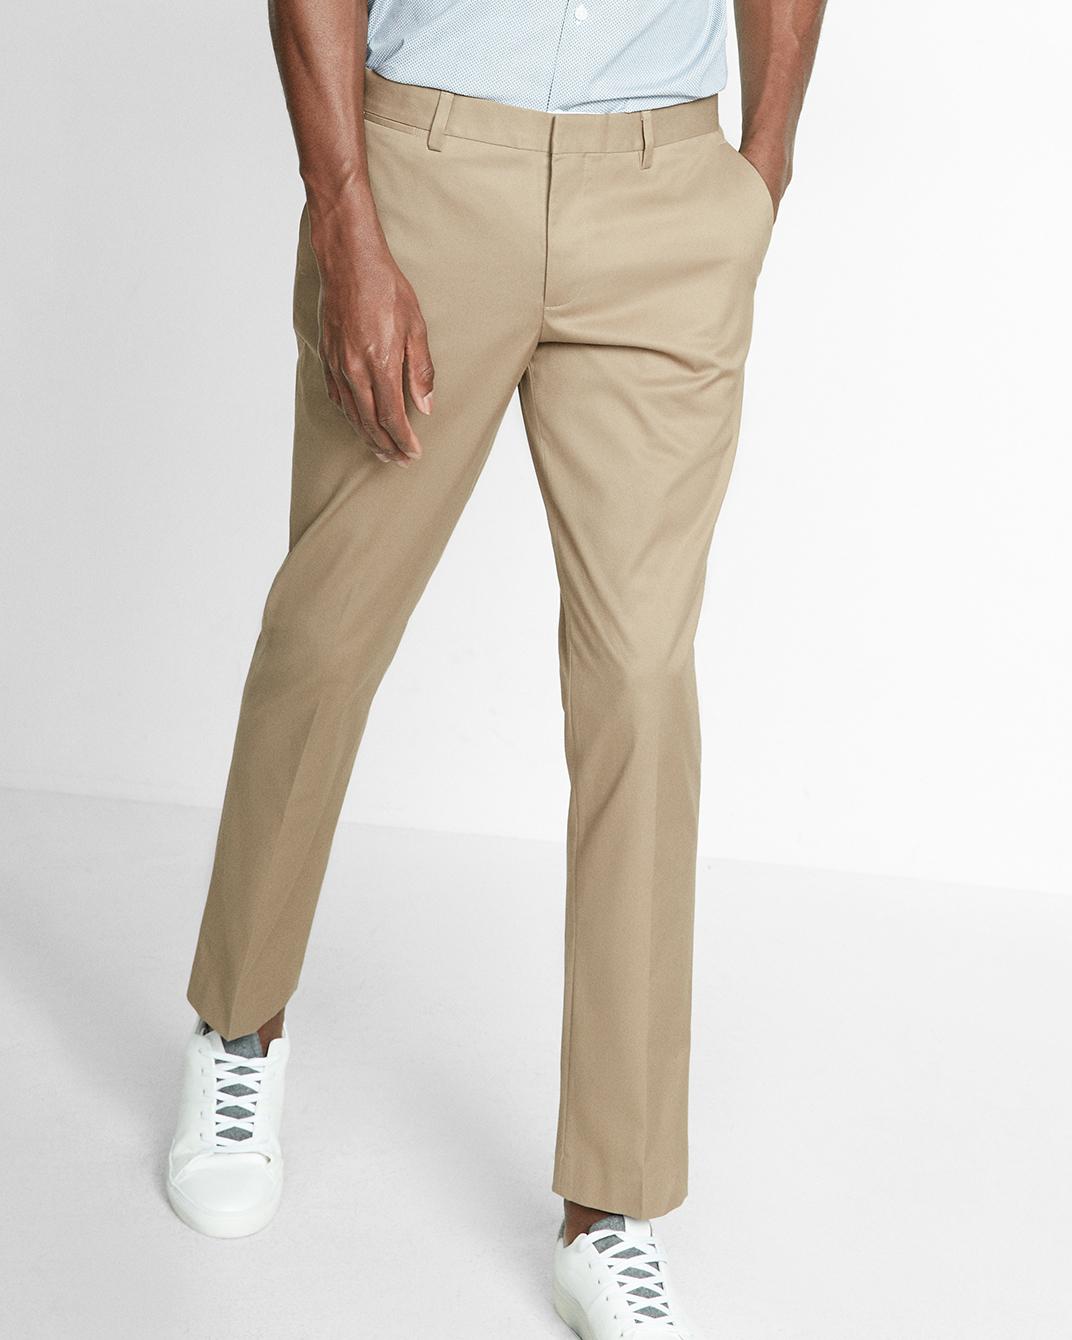 extra-slim-stretch-cotton-dress-pant